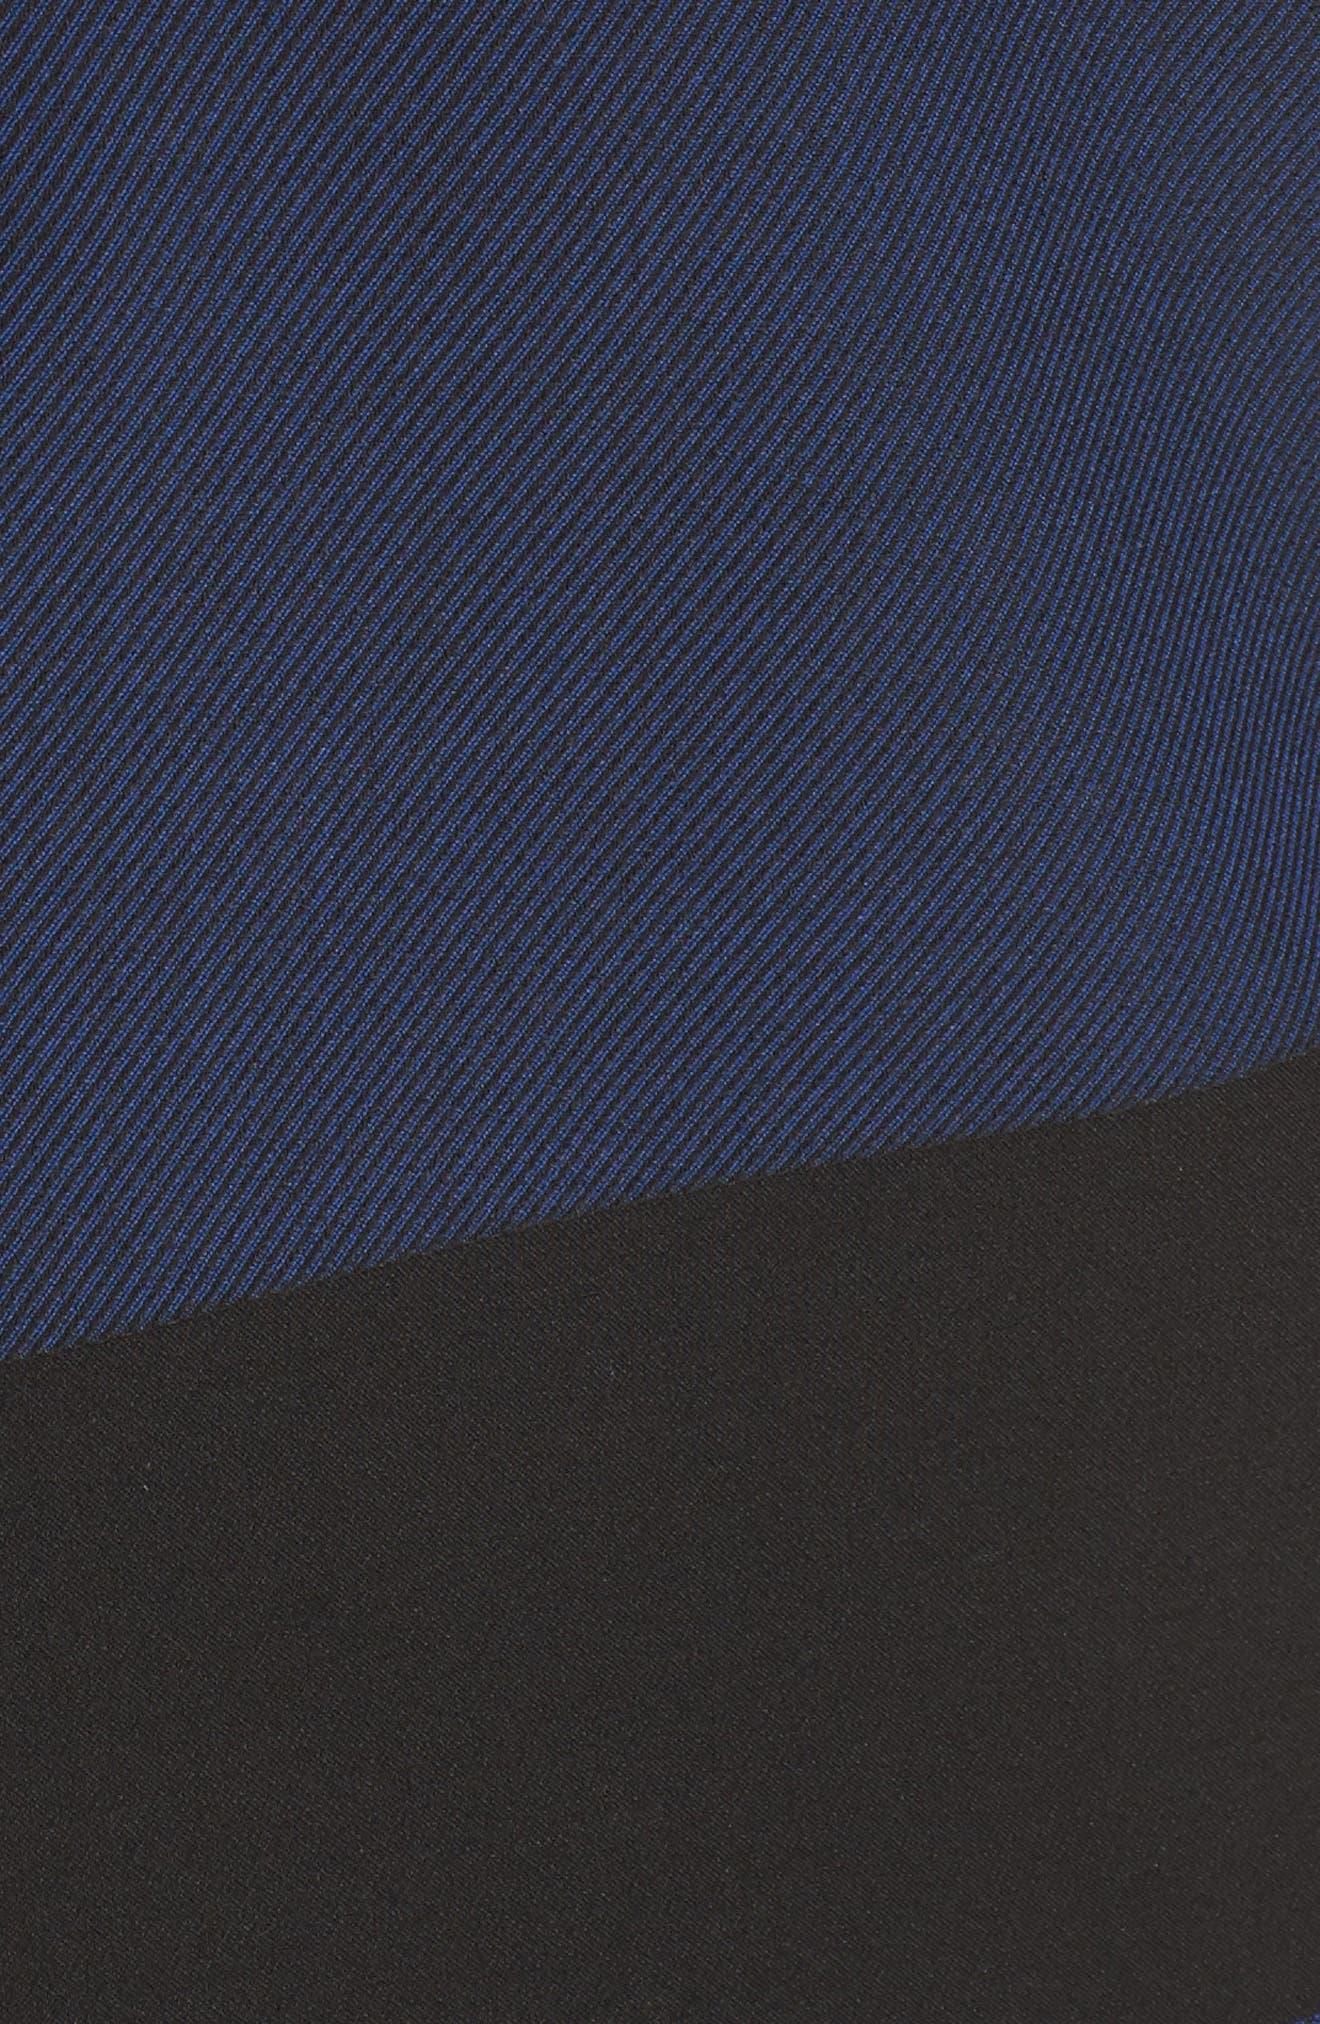 Hermely Stripe Sheath Dress,                             Alternate thumbnail 5, color,                             400